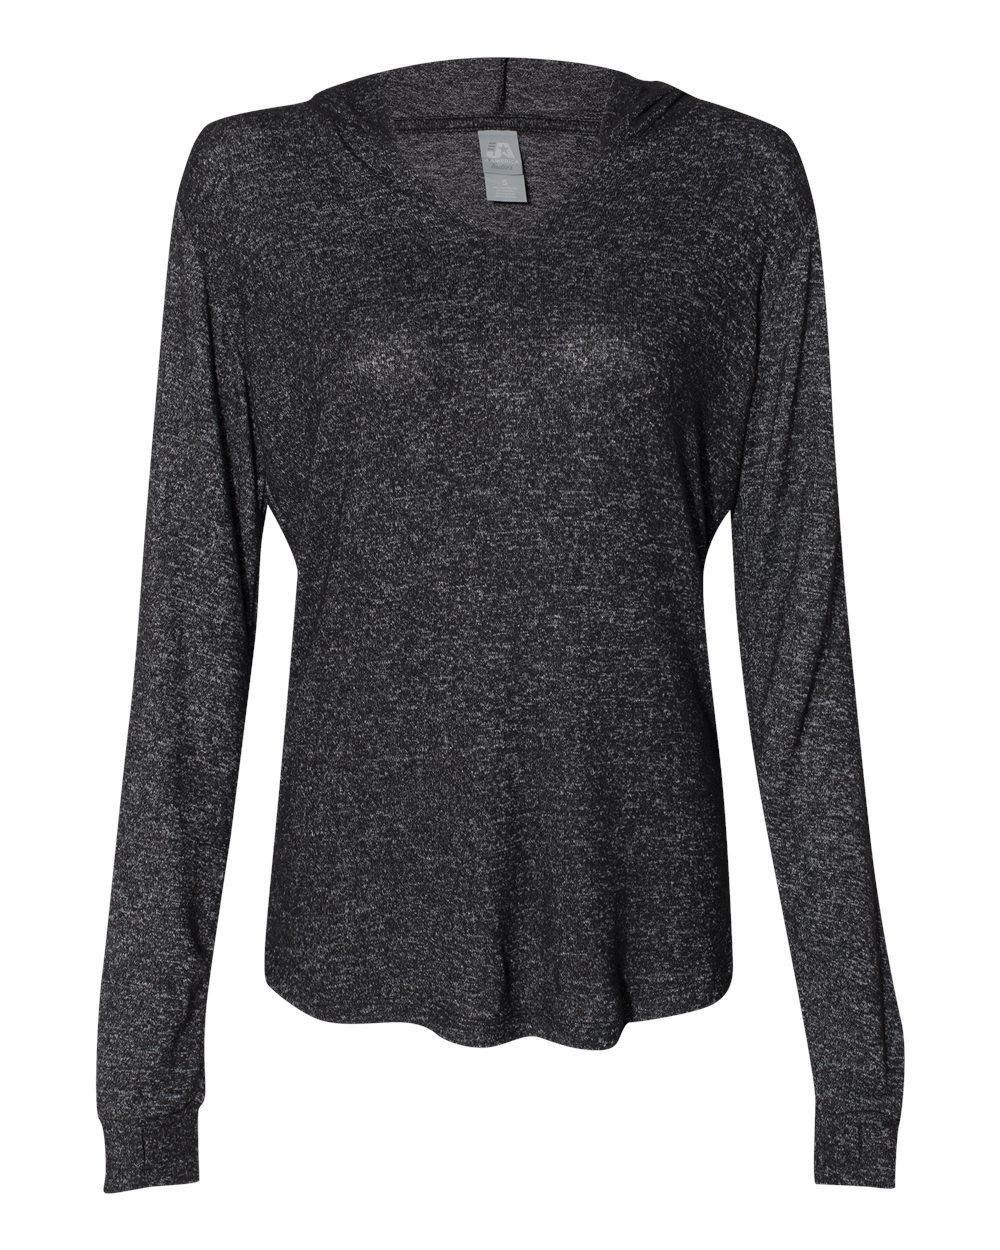 Cozy Fleece Women's Hooded Pullover